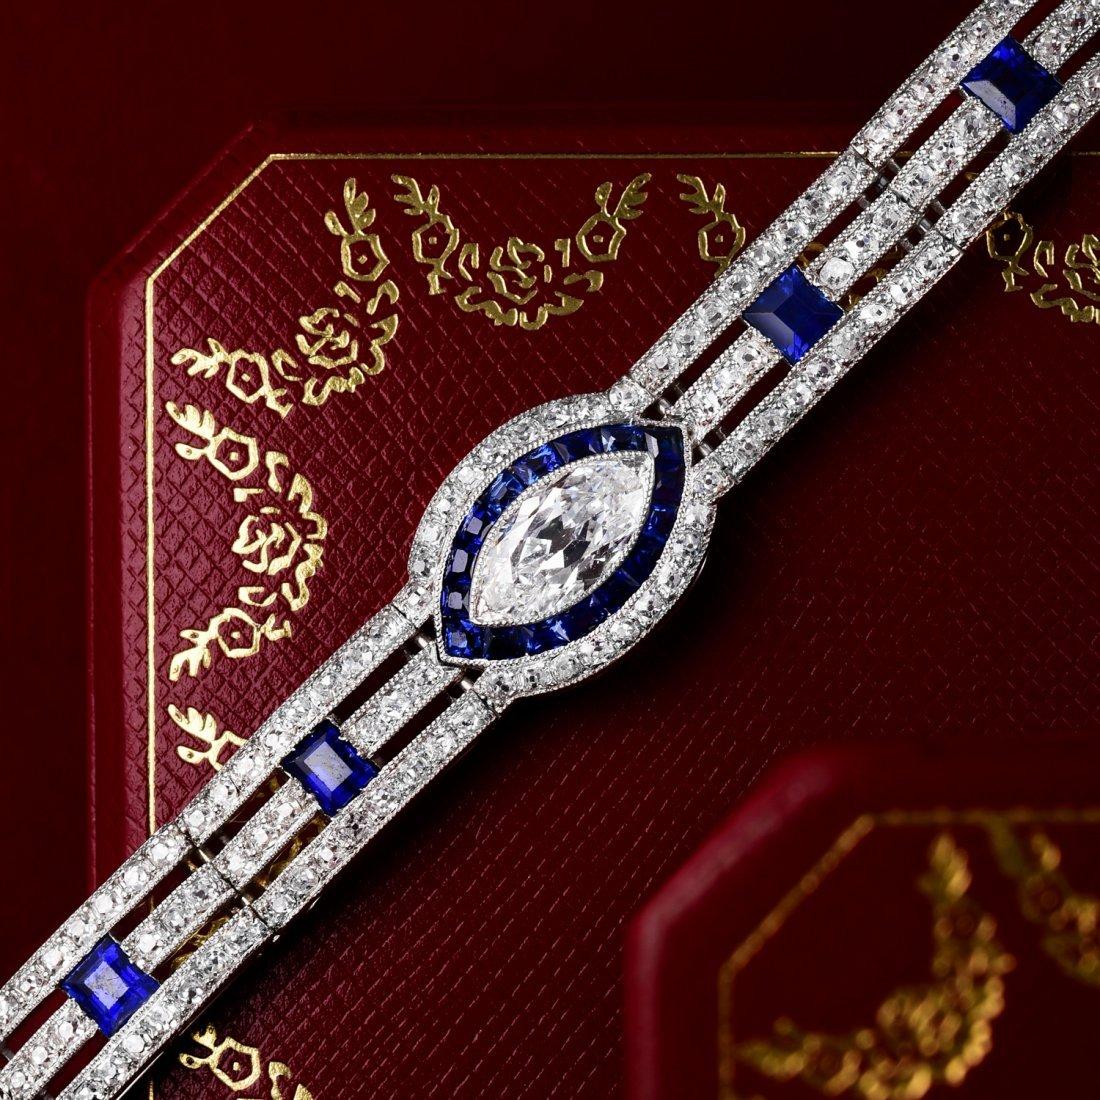 Cartier Art Deco Sapphire and Diamond Bracelet